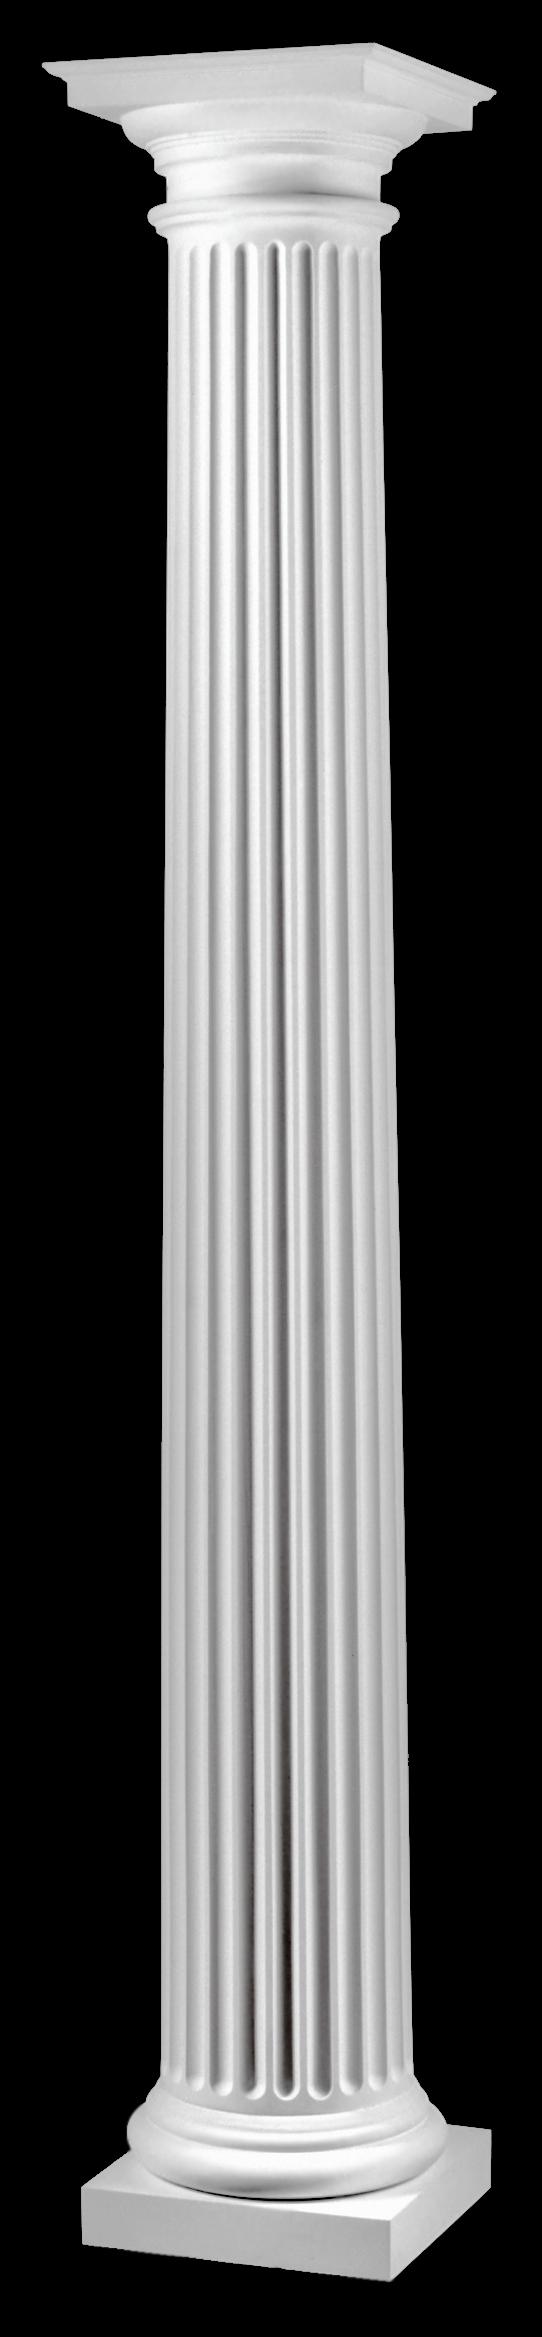 Fluted columns roman doric columns chadsworth 39 s for Doric columns